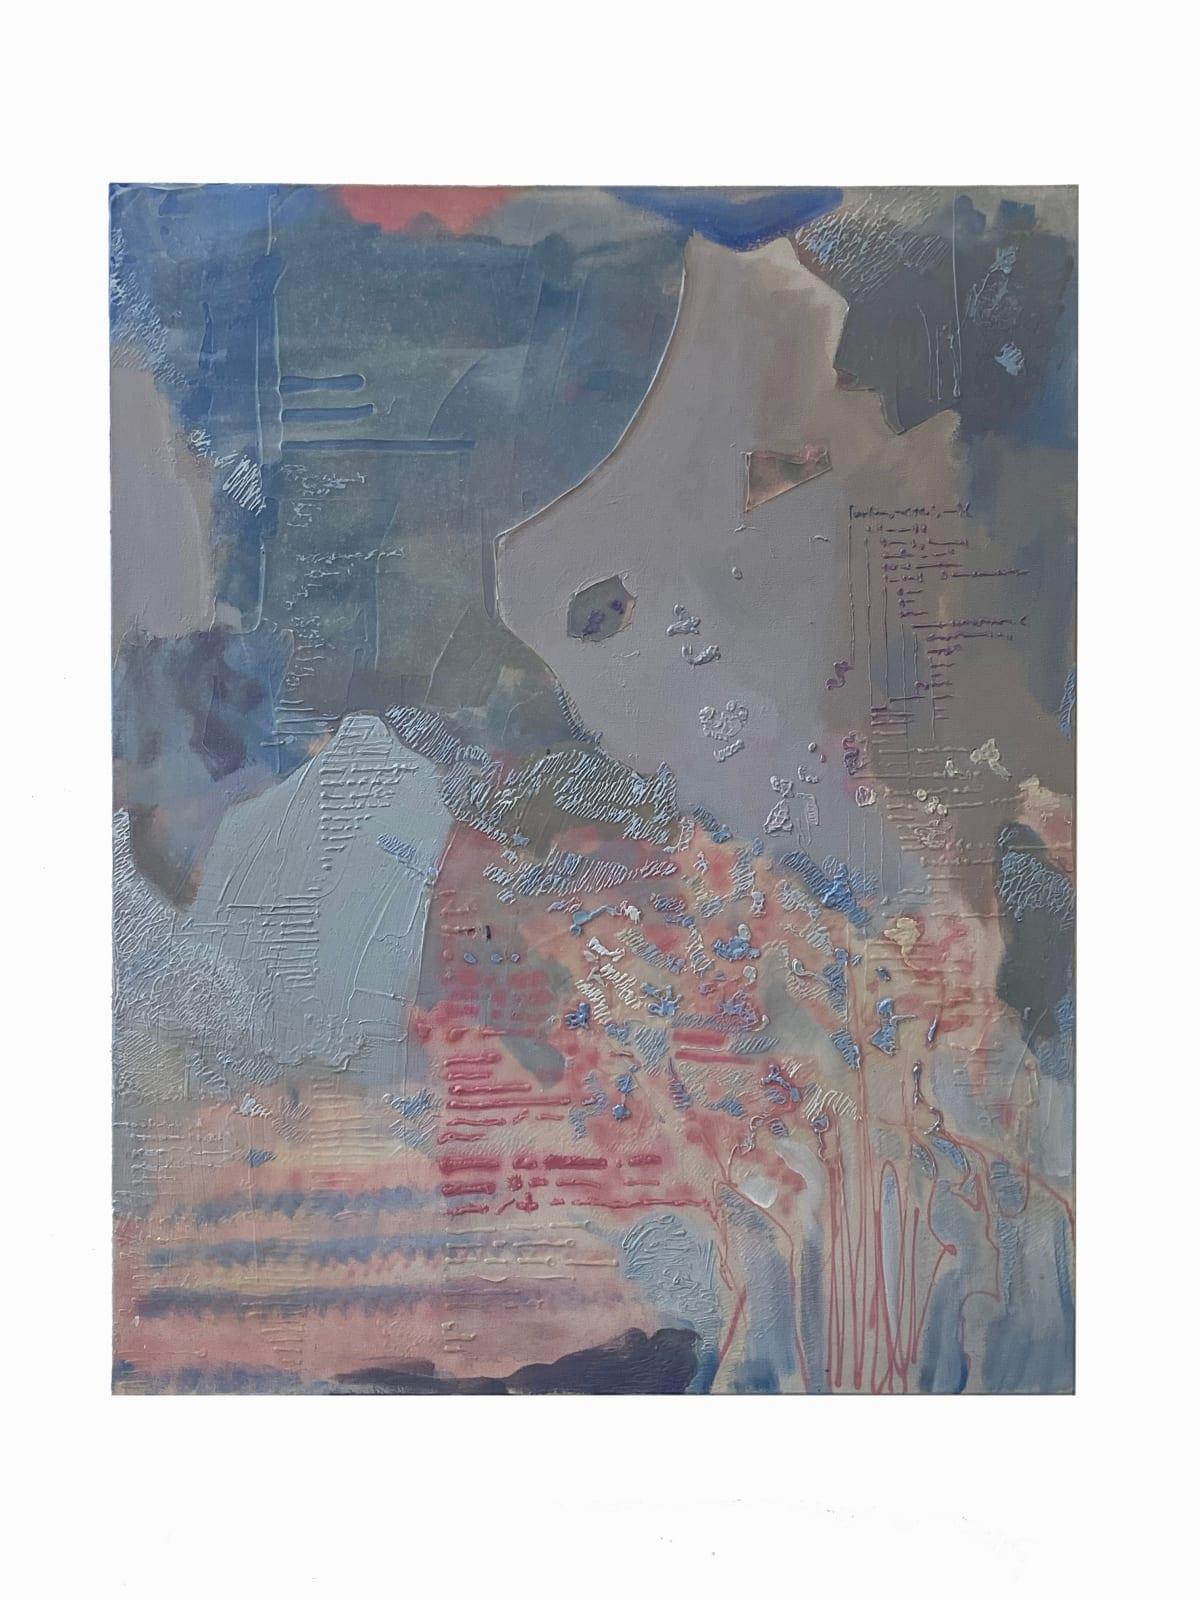 Ricardo Cabret Un Nuevo Lenguaje, 2020 Gel polymers and acrylic on canvas 40 x 50 in 101.6 x 127 cm